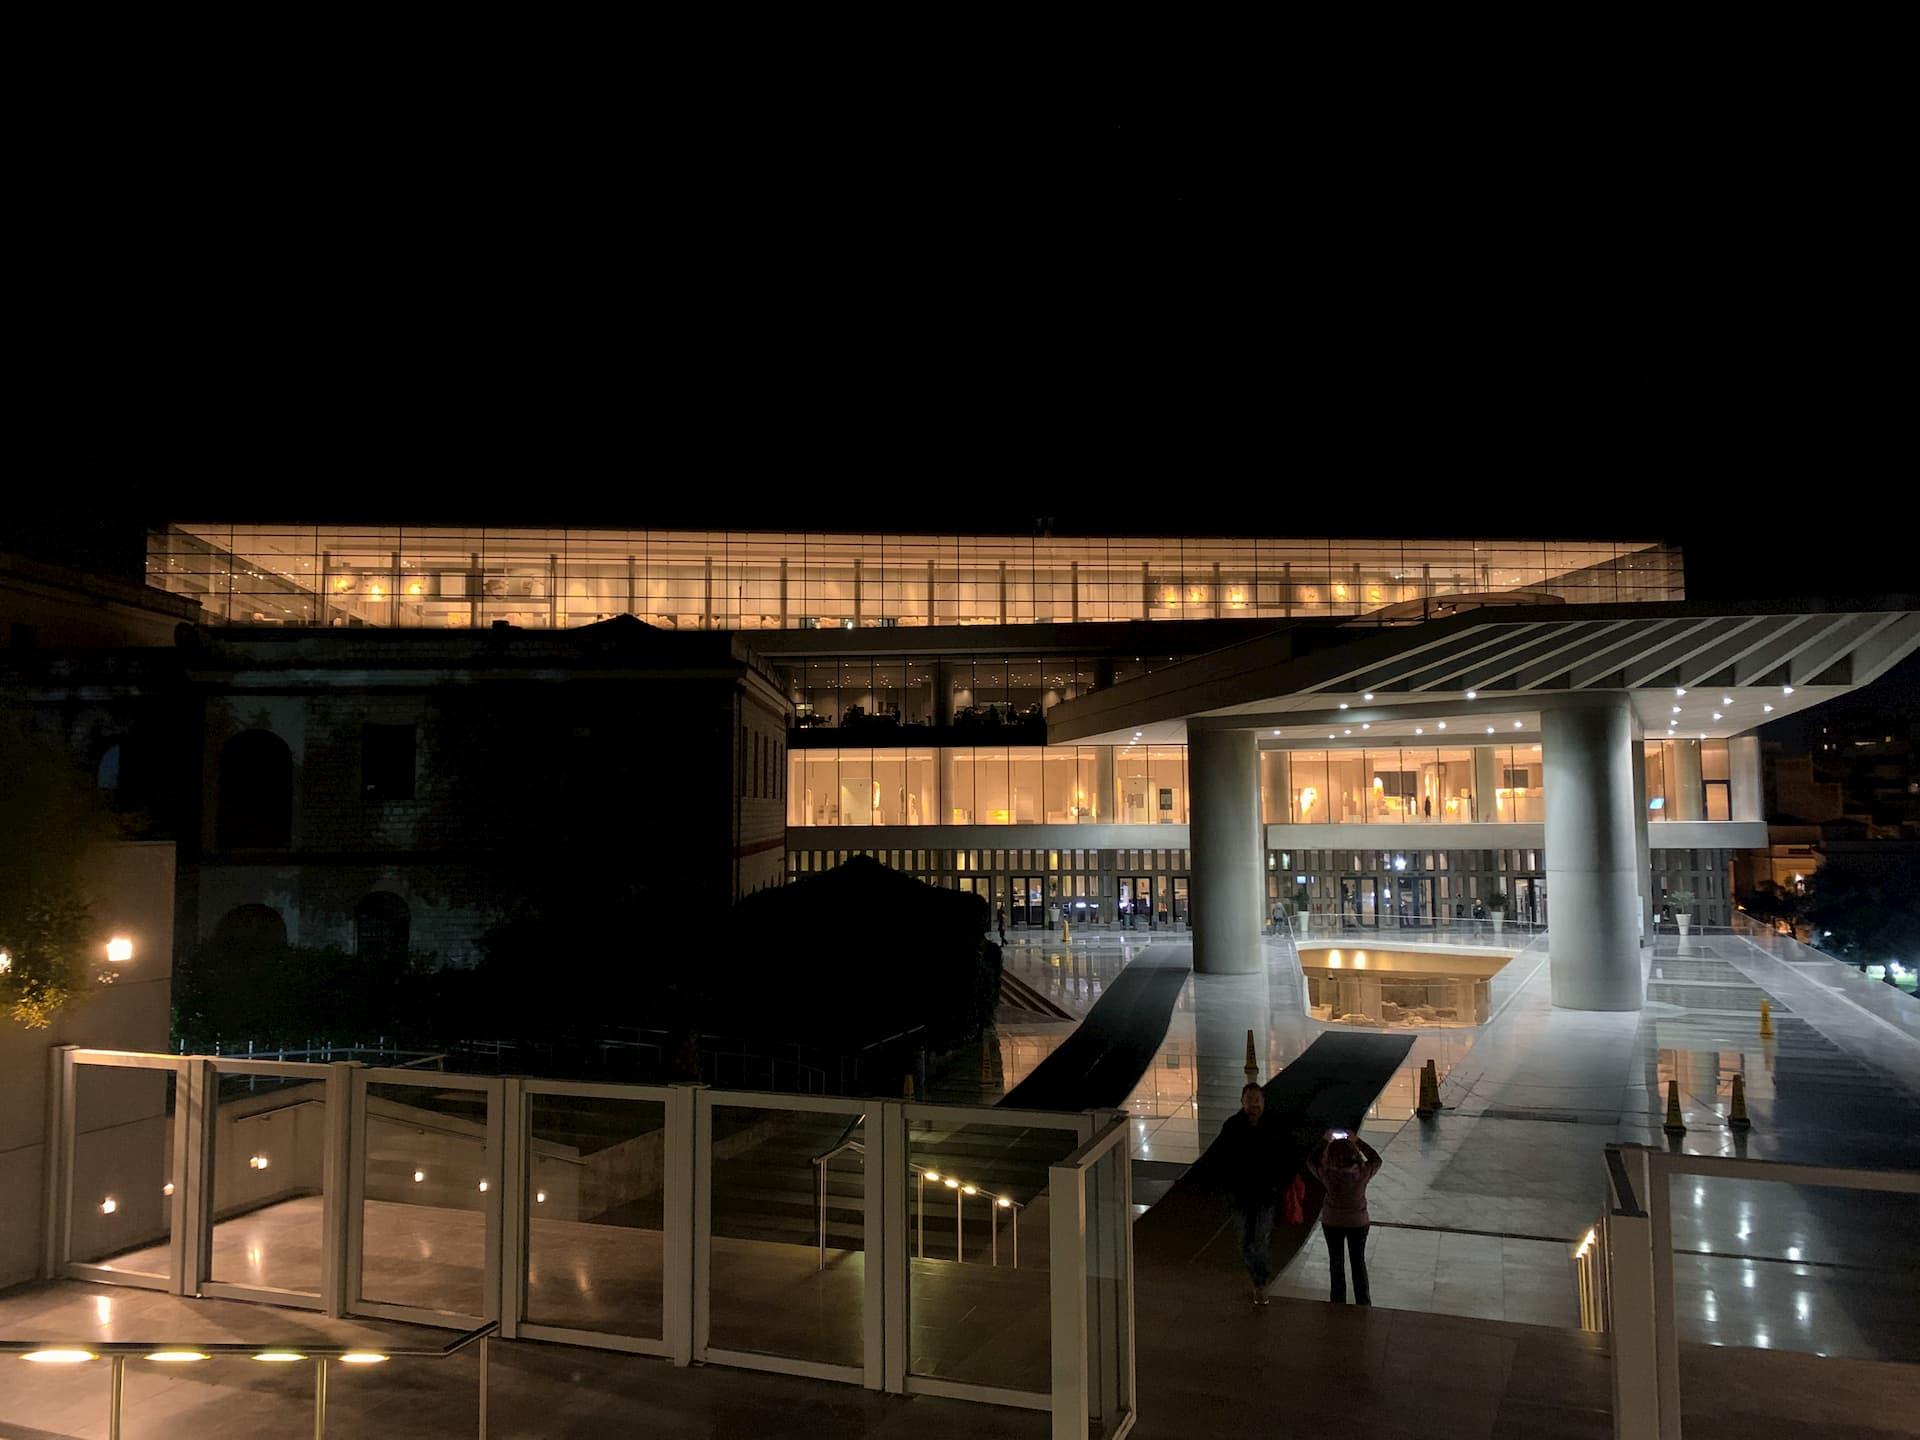 Museo archeologico night